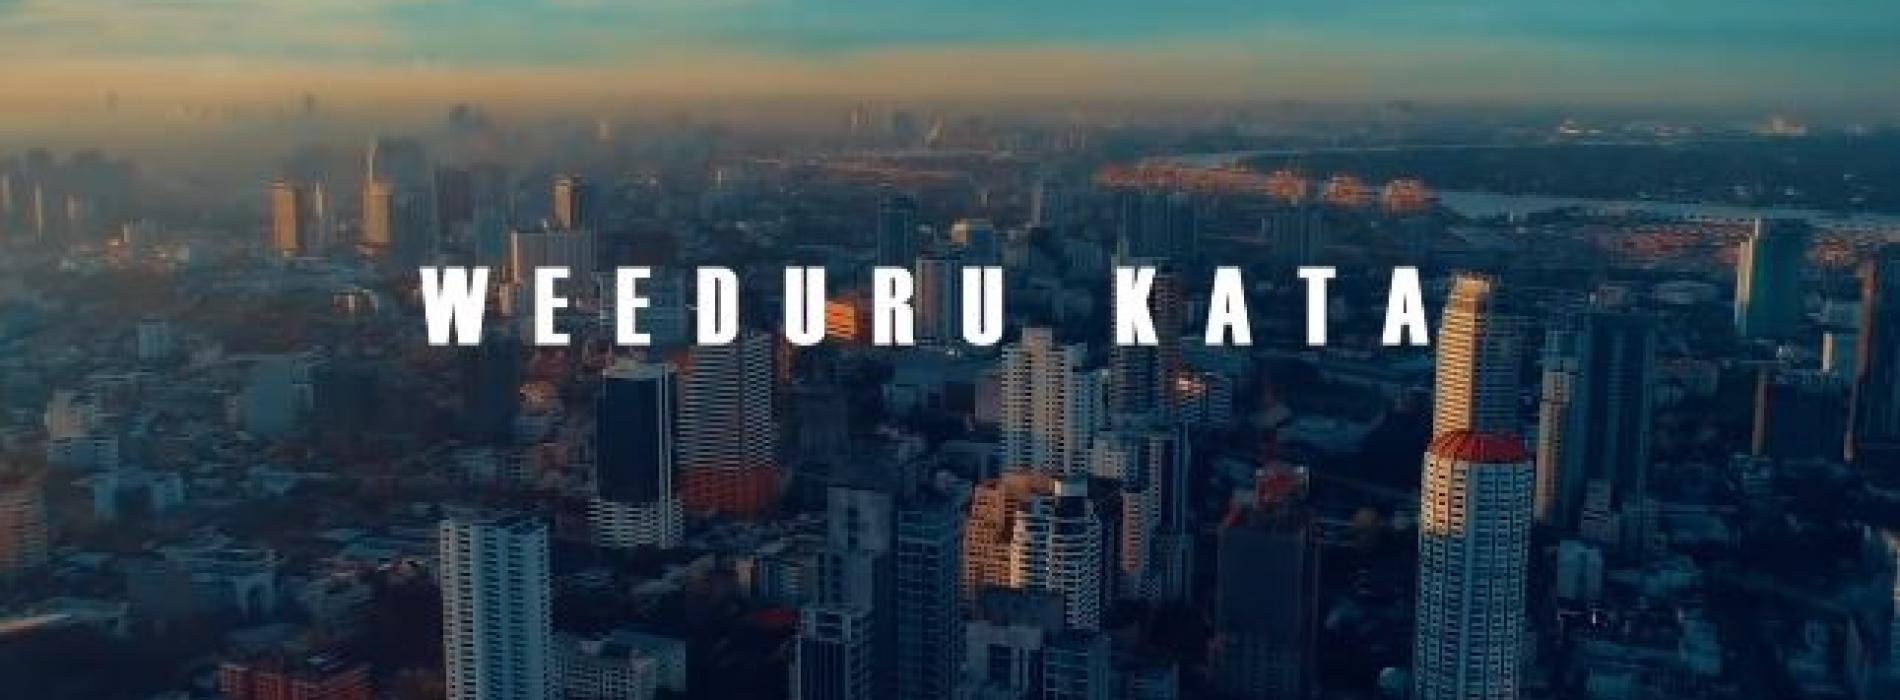 New Music : Weeduru Kata (වීදුරු කැට) Sajith Madusanka ft Shehan & Shanuka, Jadon Fonka (Official Music Video)